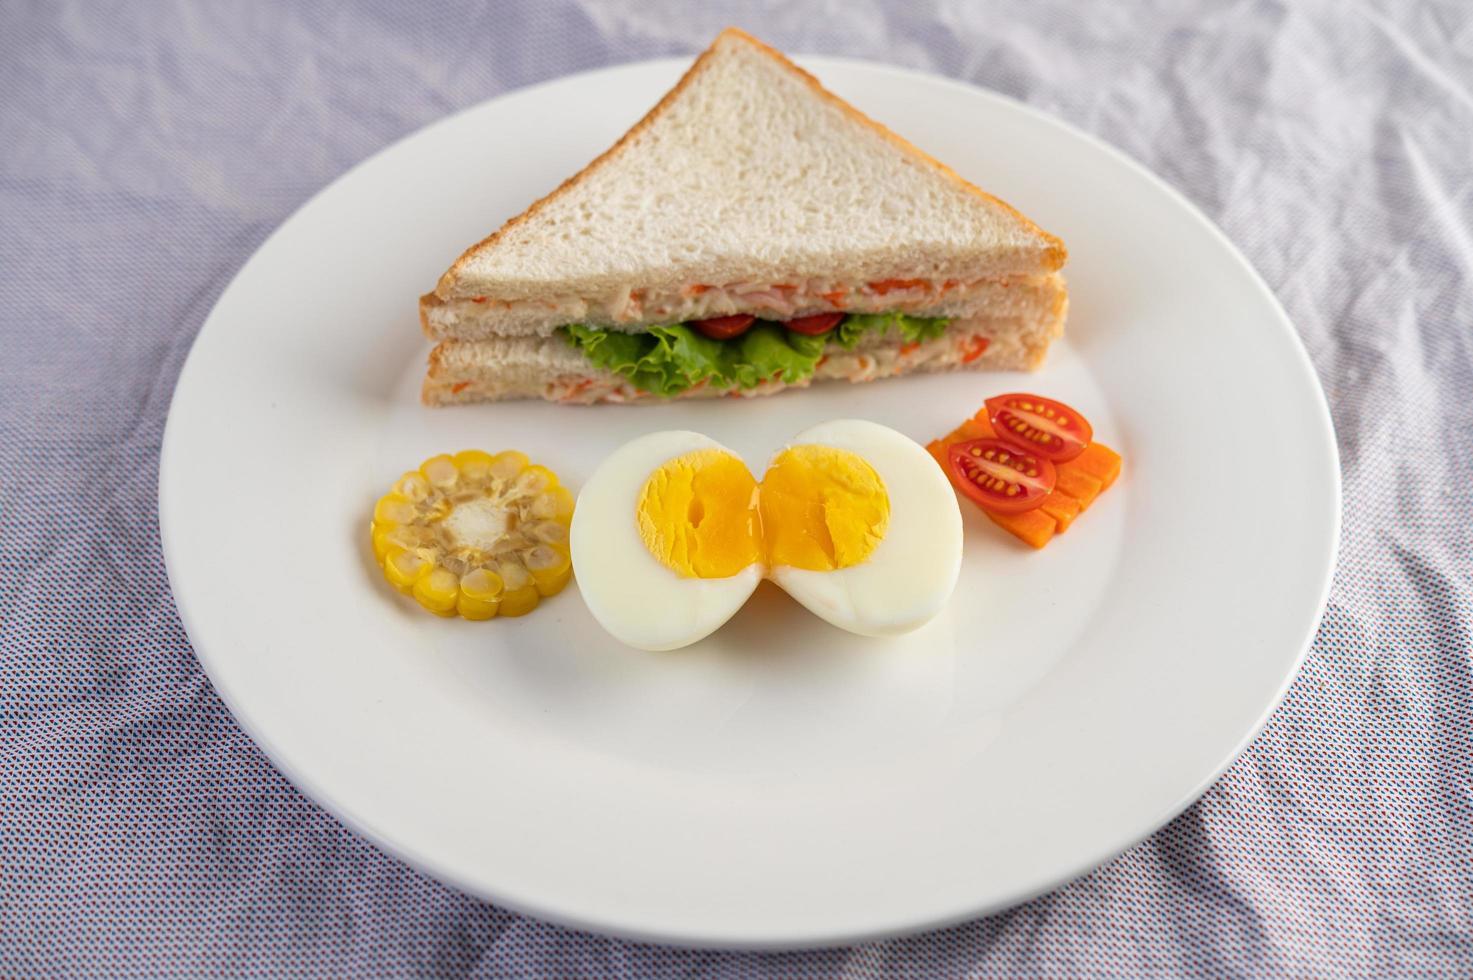 gekookte eieren, maïs, tomatensandwich op een witte plaat foto